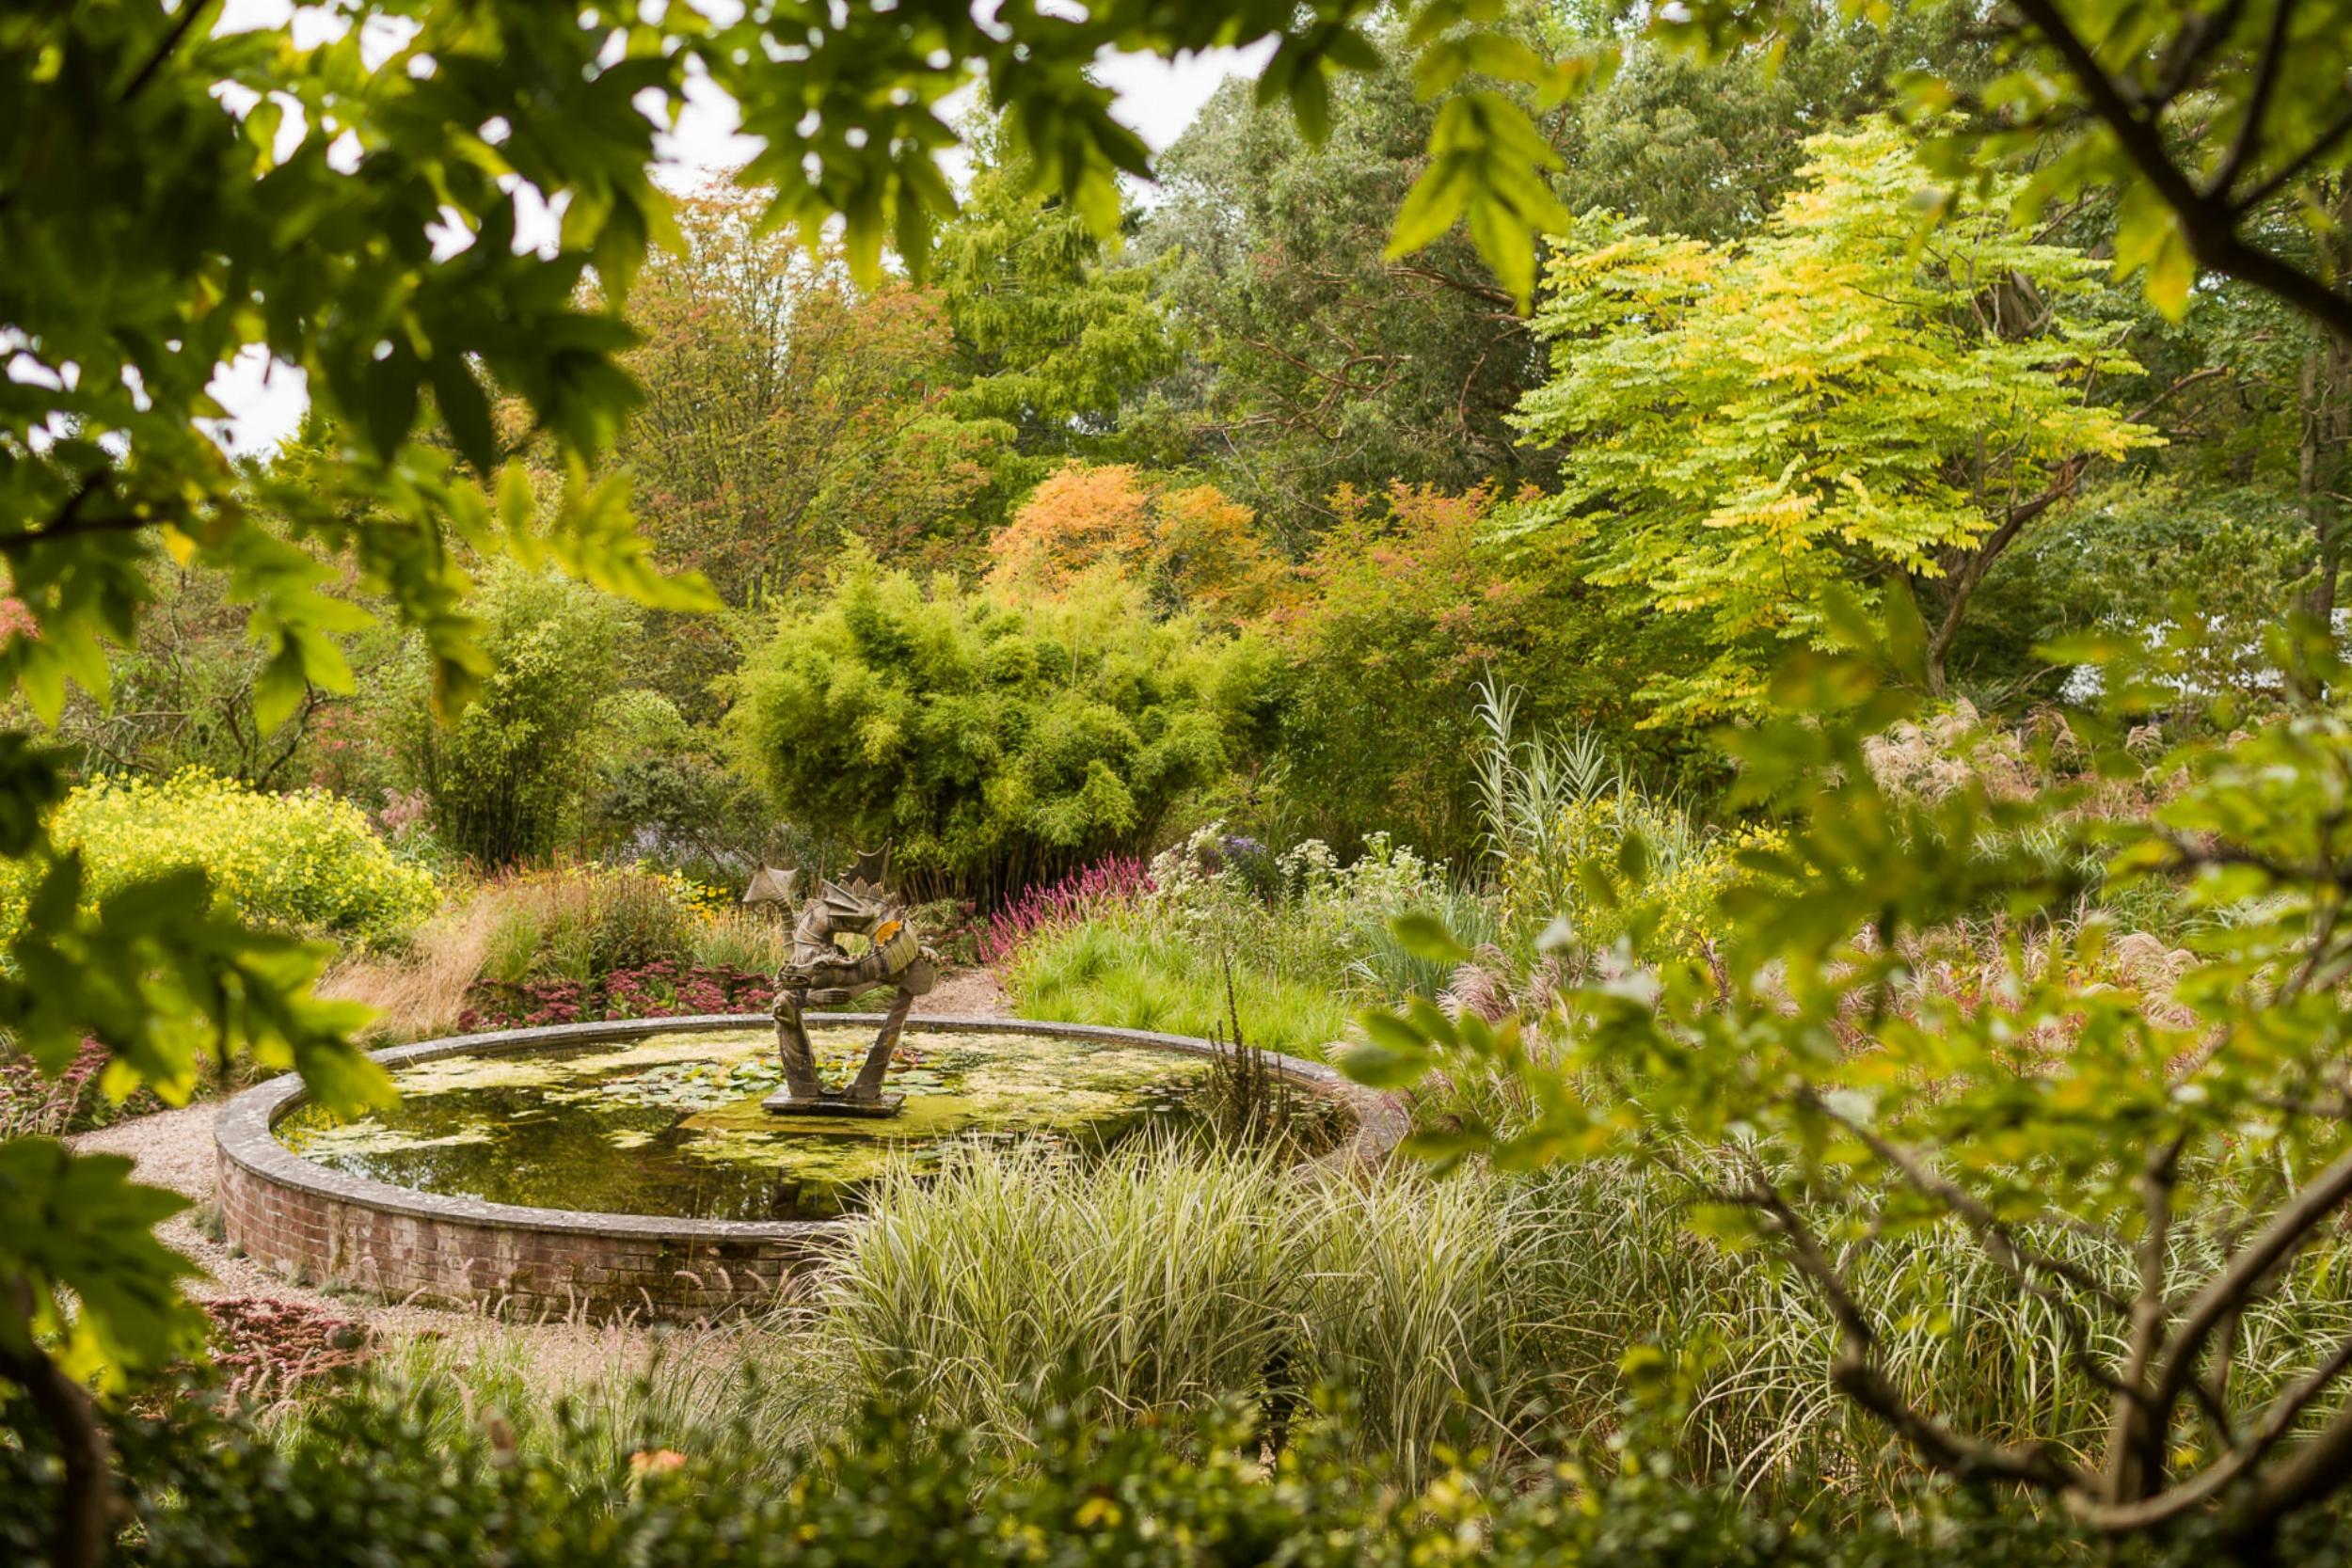 _X1A7046-garden-photography-andy-maybury-knoll-gardens.jpg